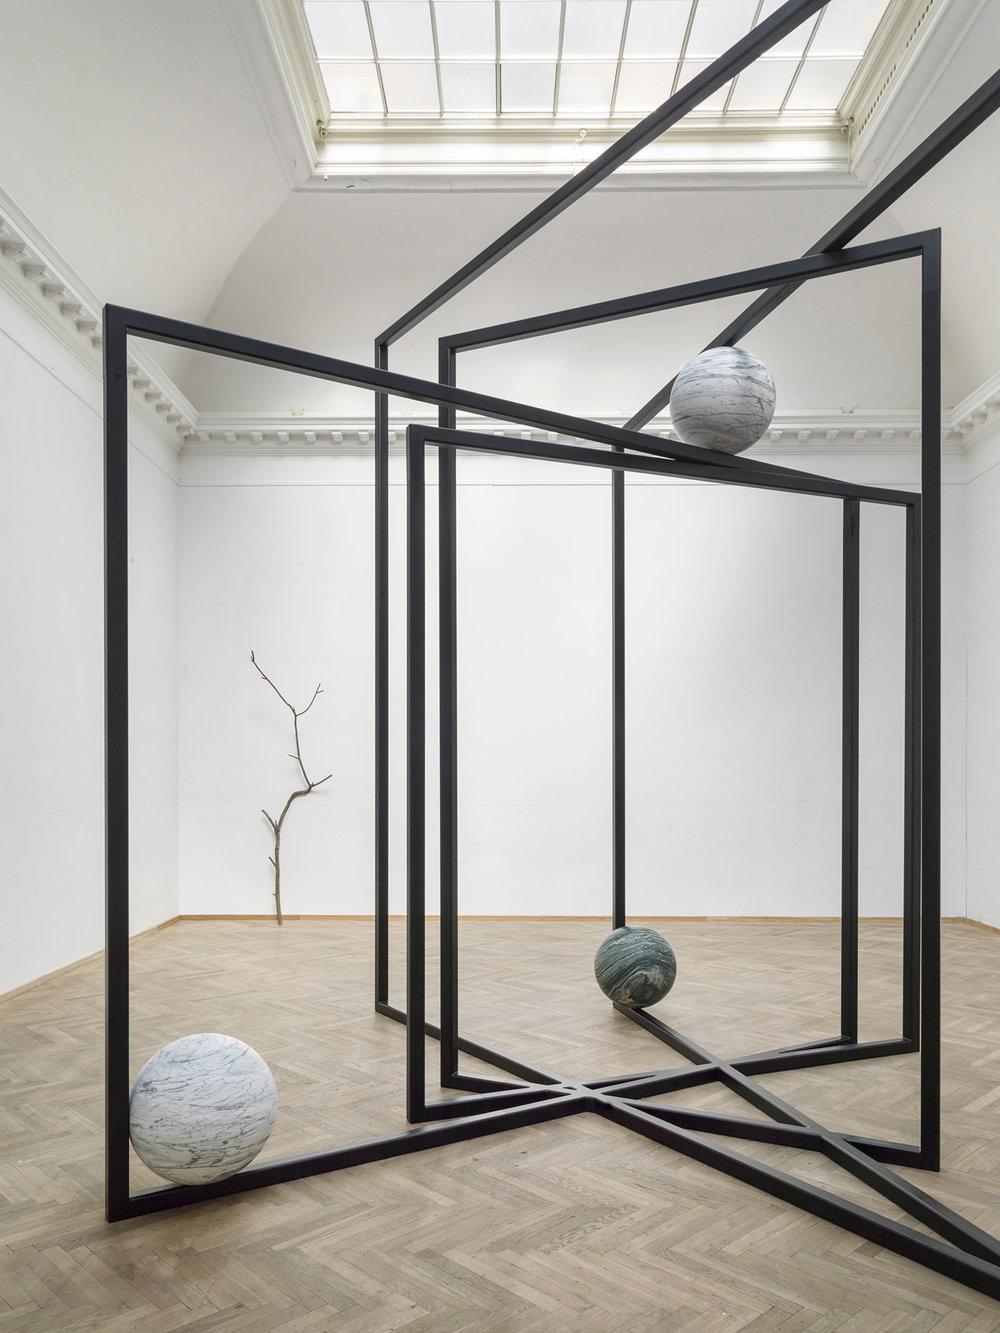 Alicja Kwade, 'DrehMoment' (2018), 'Parralelwelt (Ast/AntiAst)' (2018). Kunsthal Charlottenborg 2018. Foto: Roman März. Courtesy the artist, KÖNIG GALERIE, 303 GALLERY, kamel mennour.